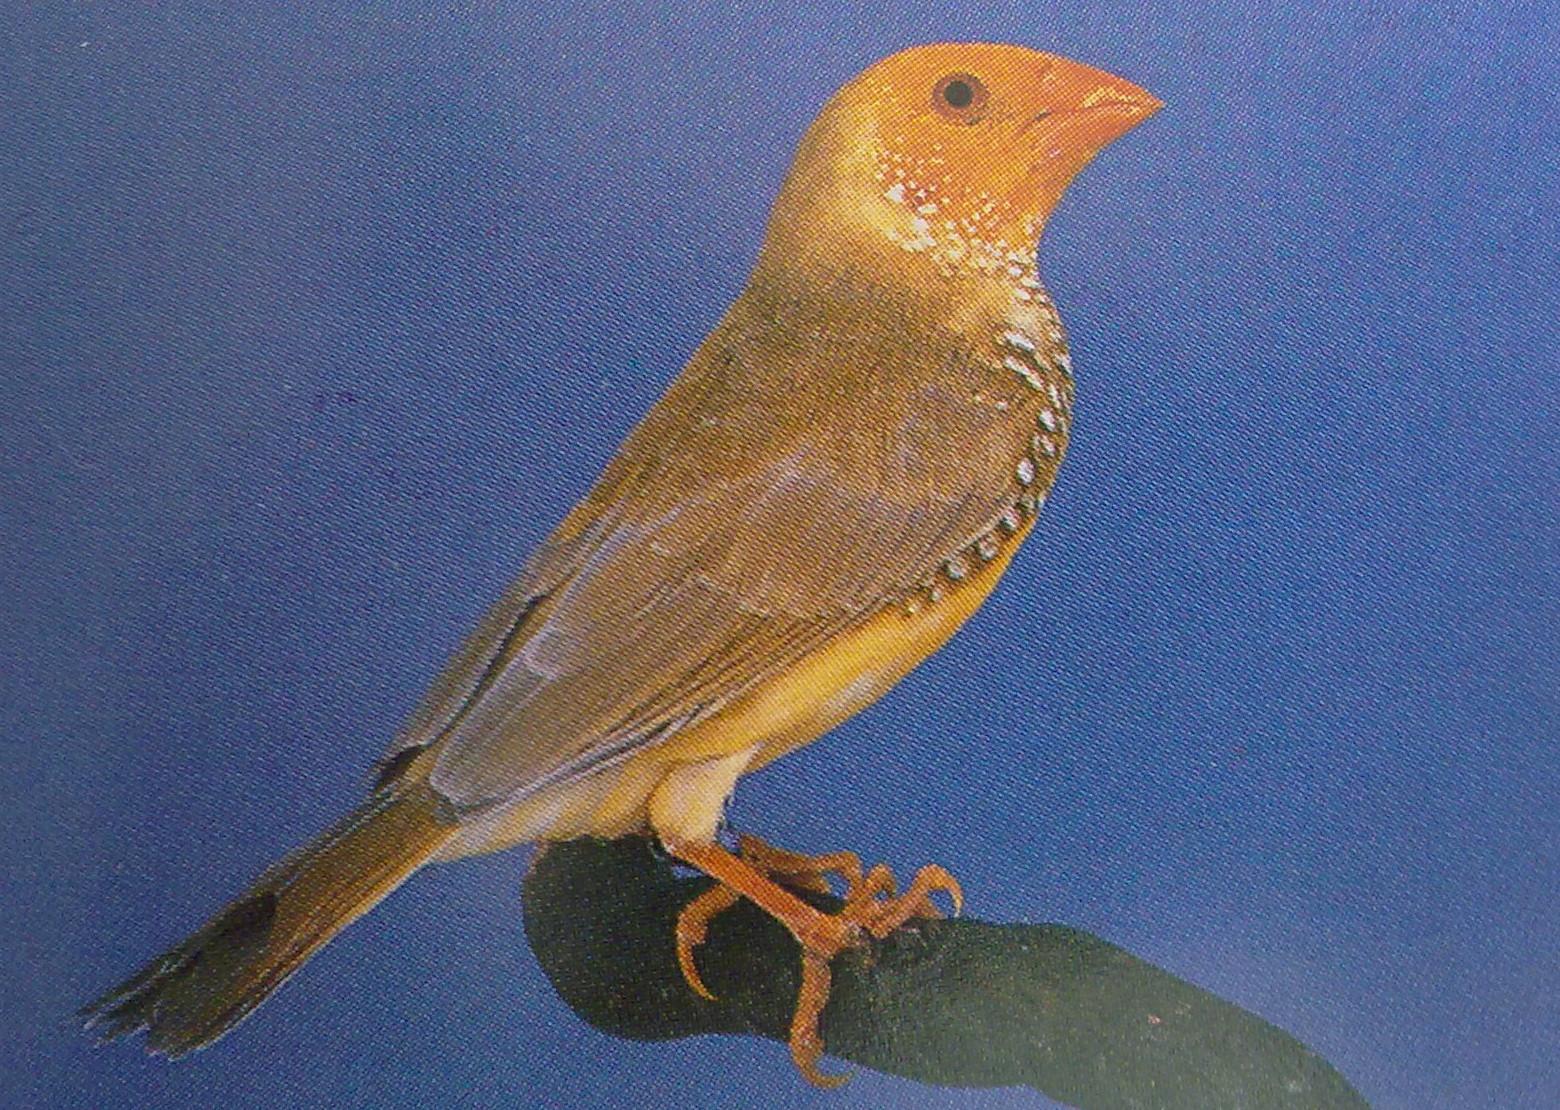 Yellow star finch - photo#23